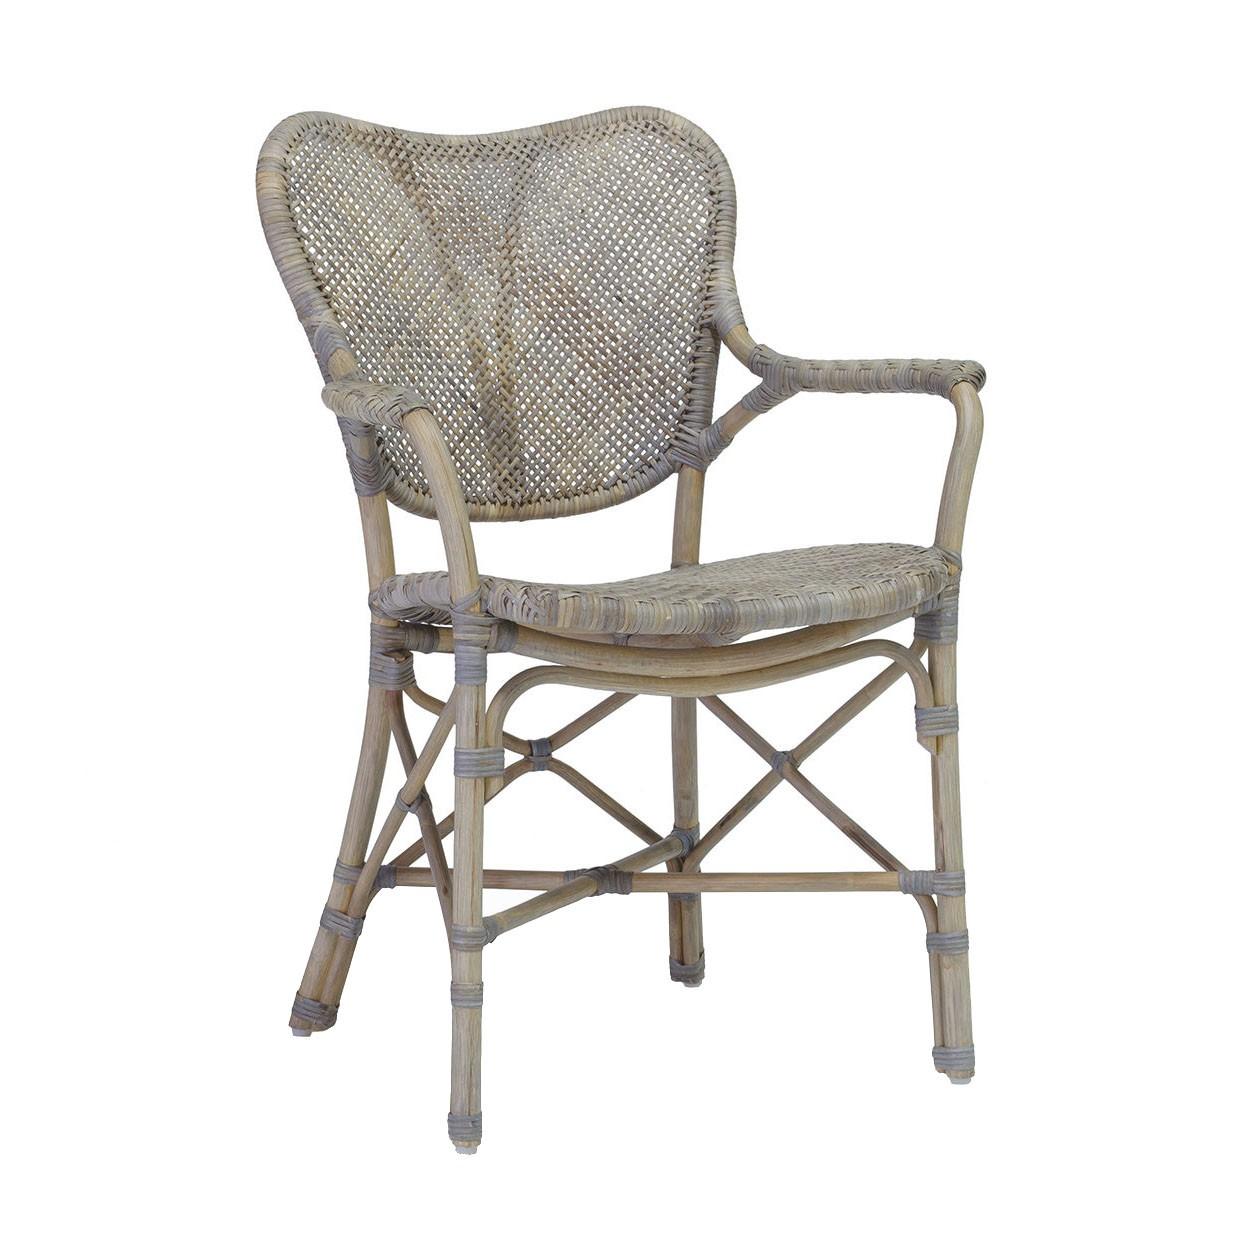 palecek jordan arm chair grey  sc 1 st  Tuvalu Home & Palecek Jordan Arm Chair Grey - Tuvalu Coastal Home Furnishings